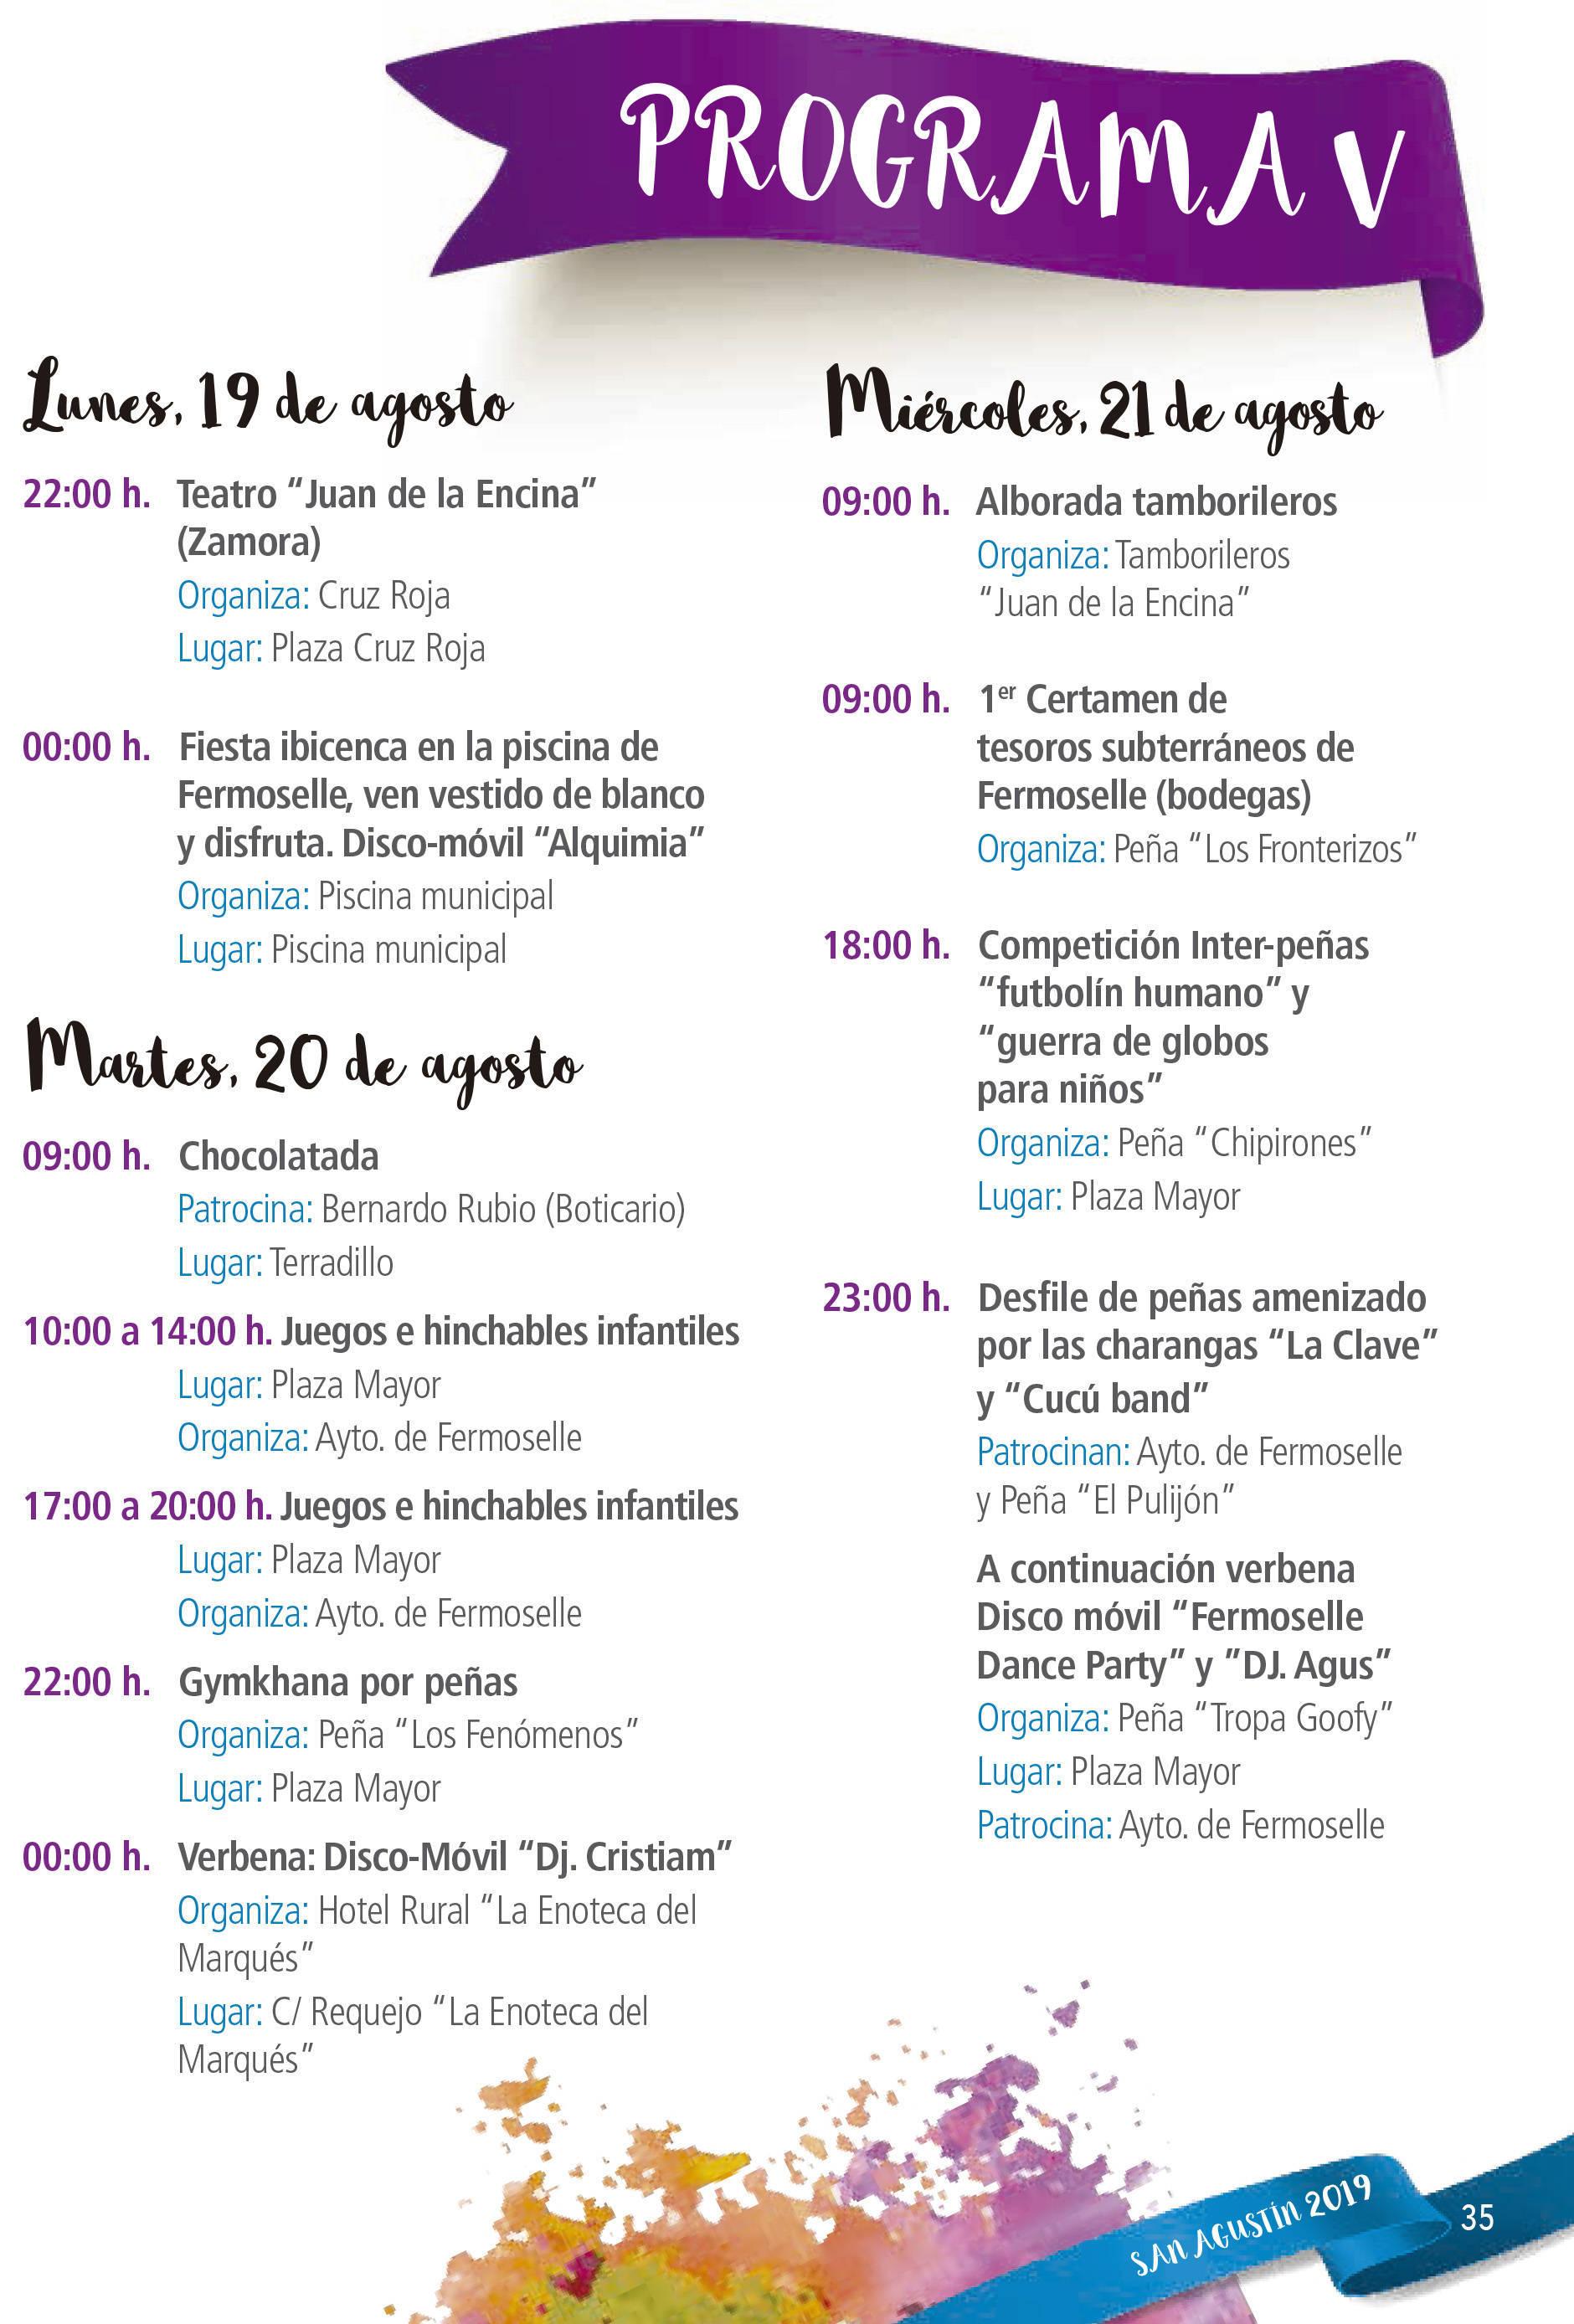 Programa de ferias y fiestas 2019 - Fermoselle (Zamora) 12